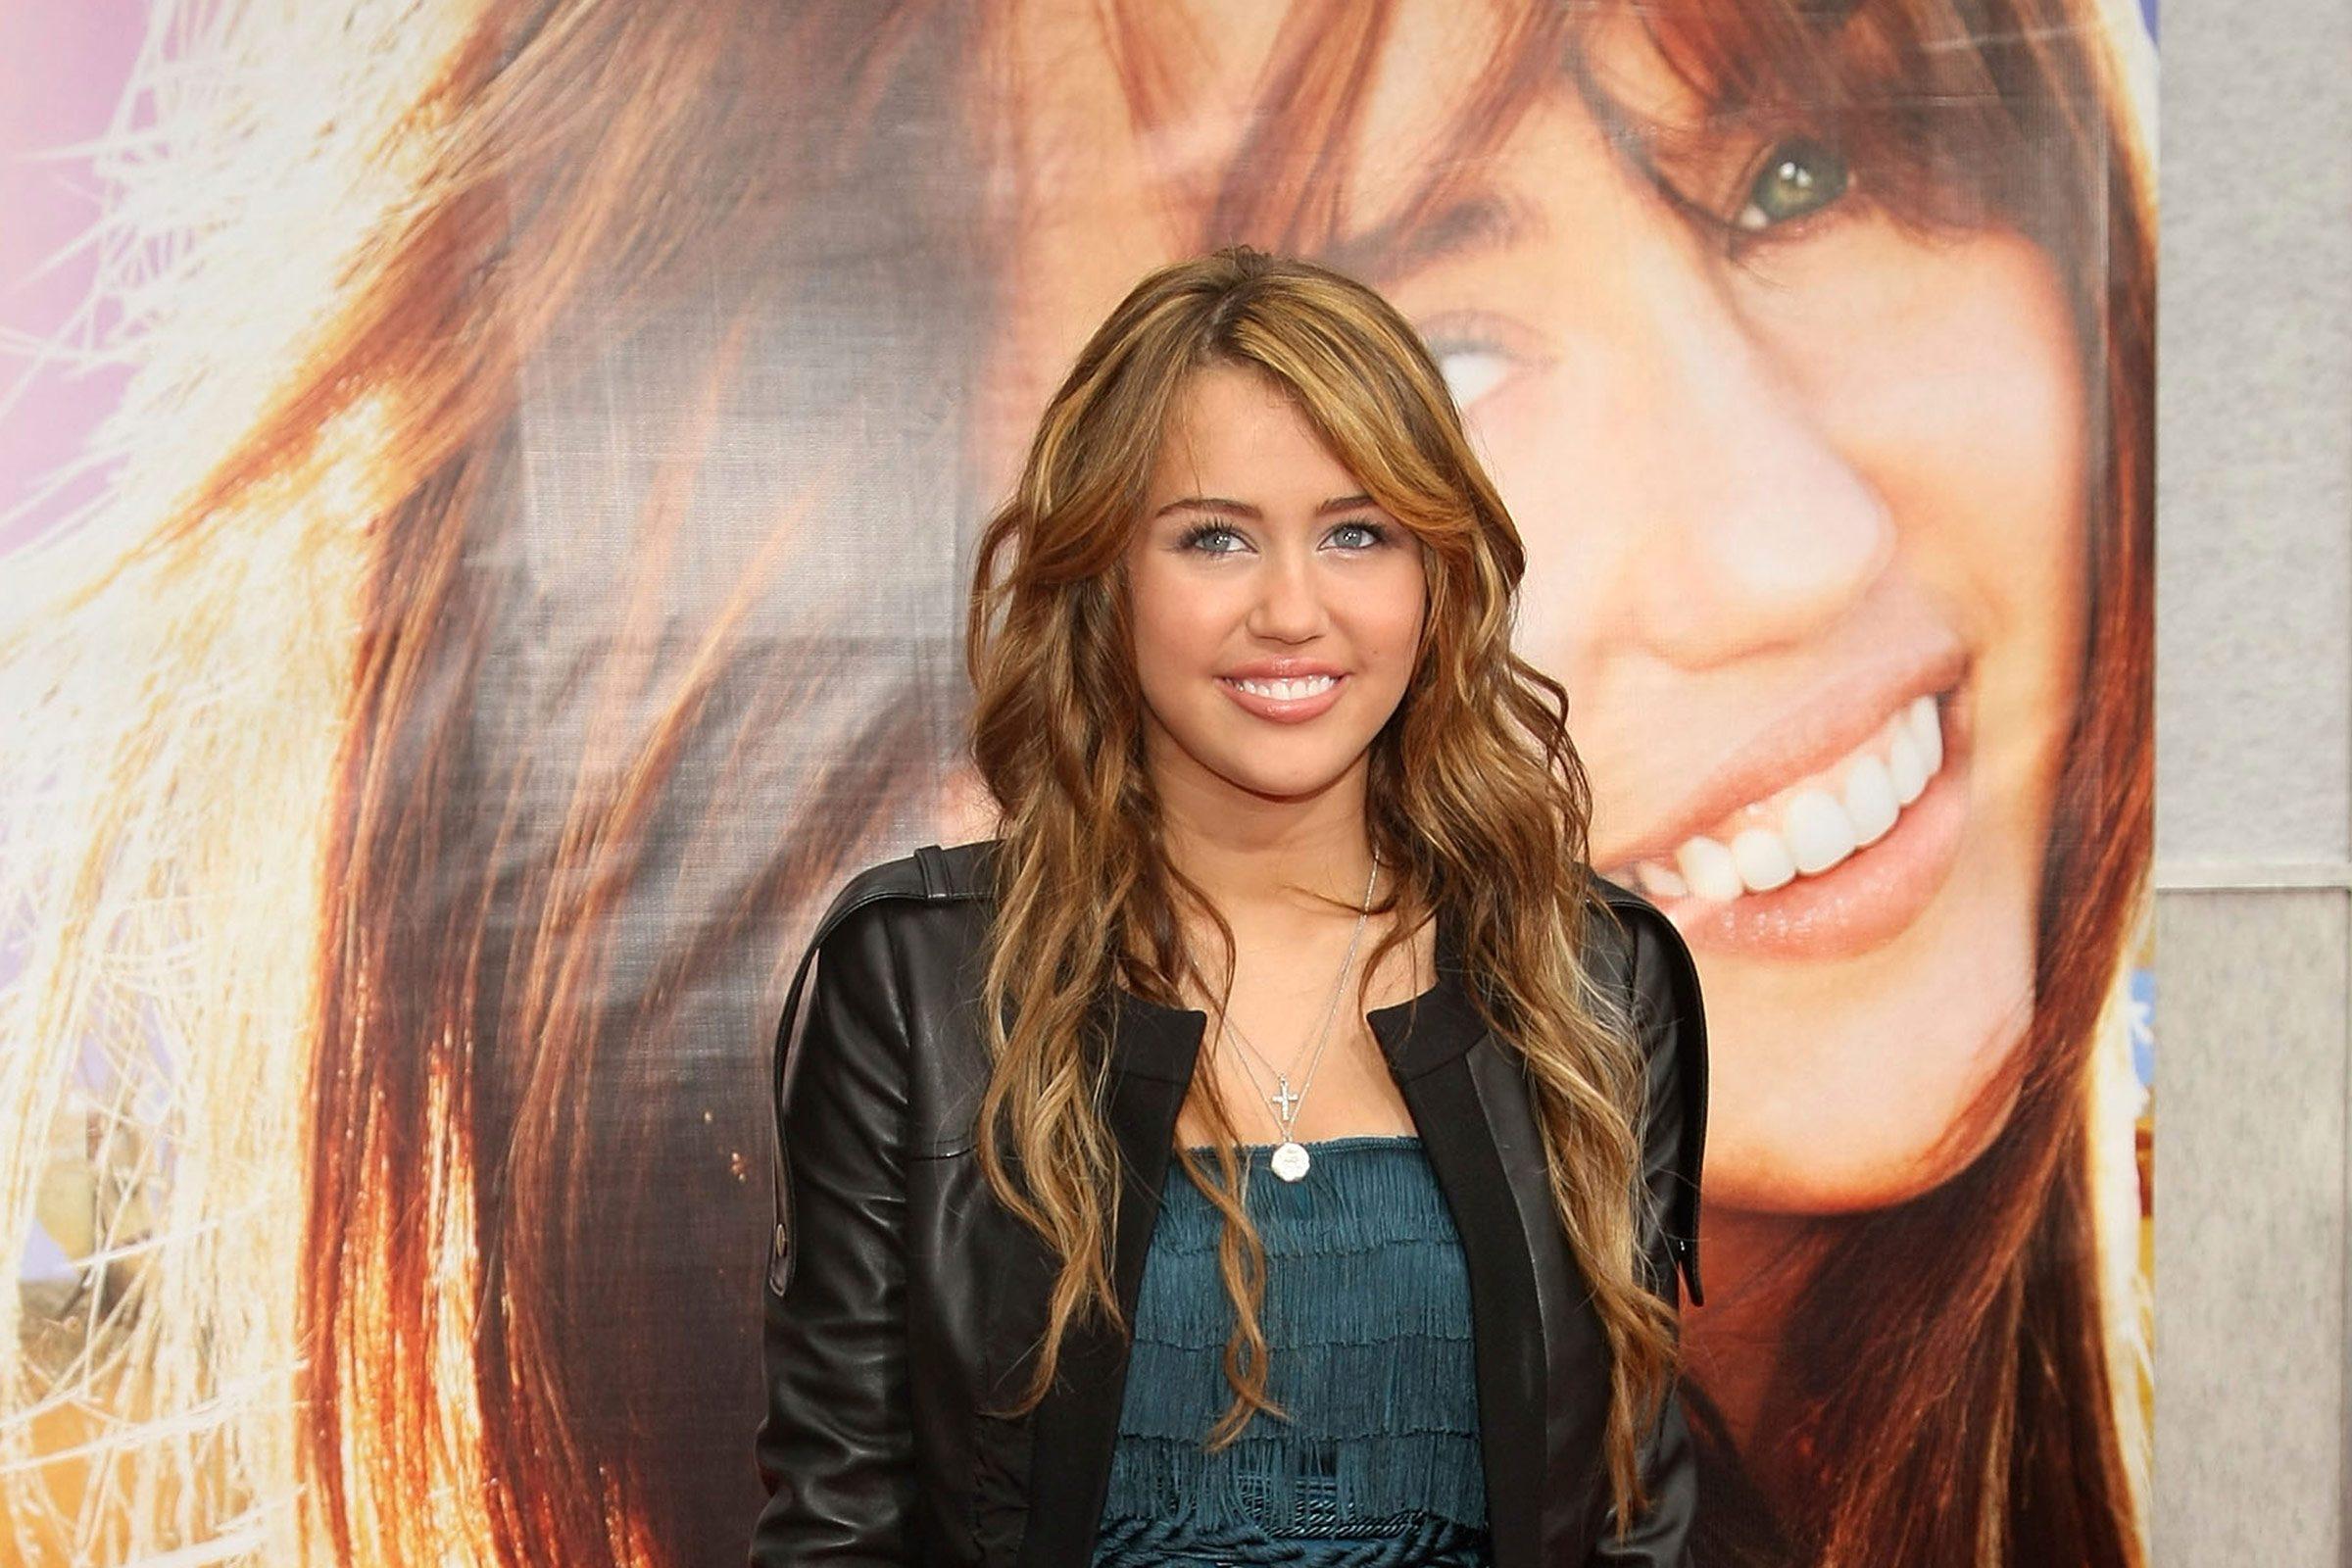 The Hannah Montana Franchise. Price Tag: $1 Billion